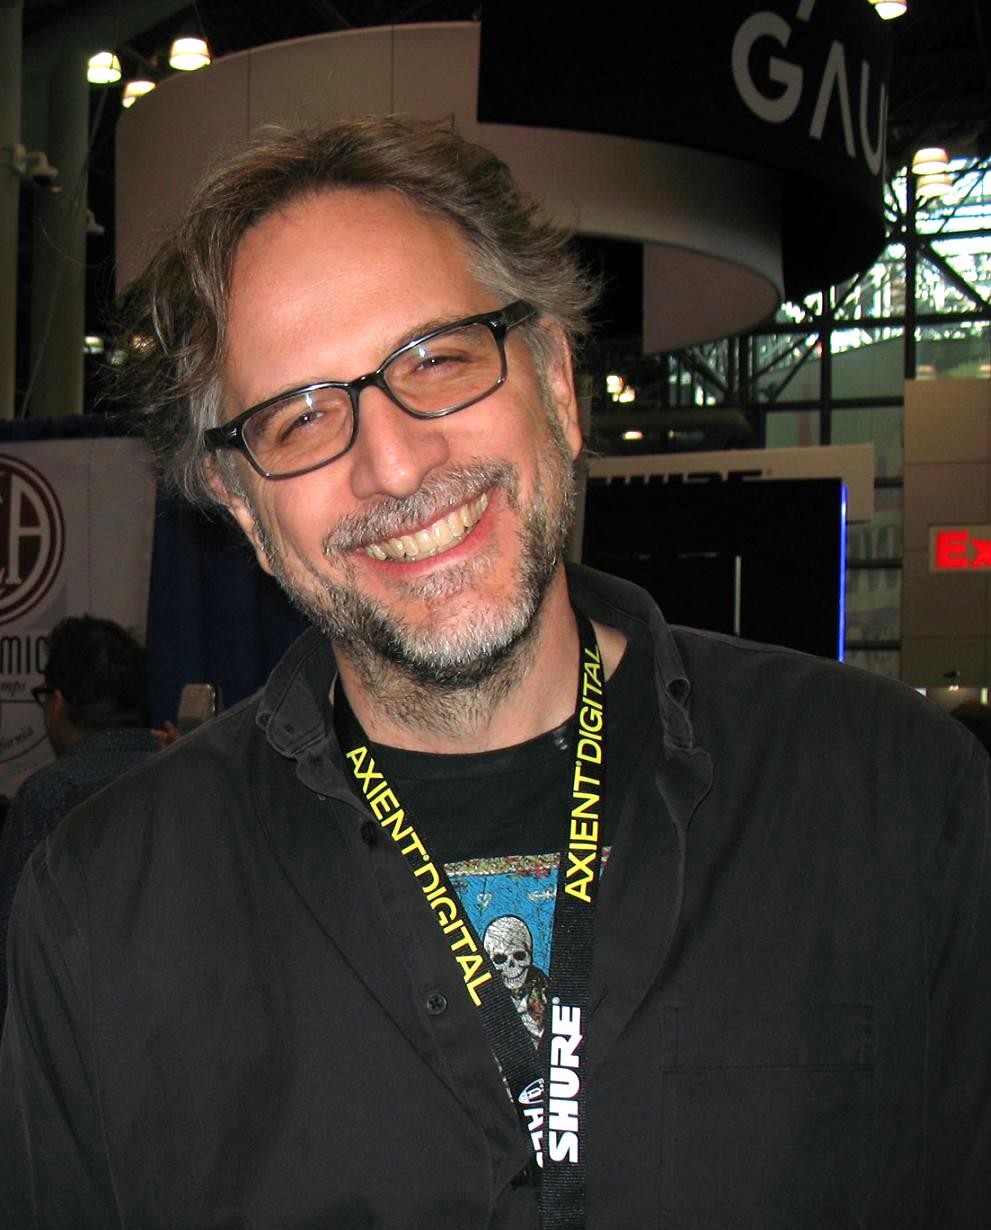 Greg-Curtis-w.jpg